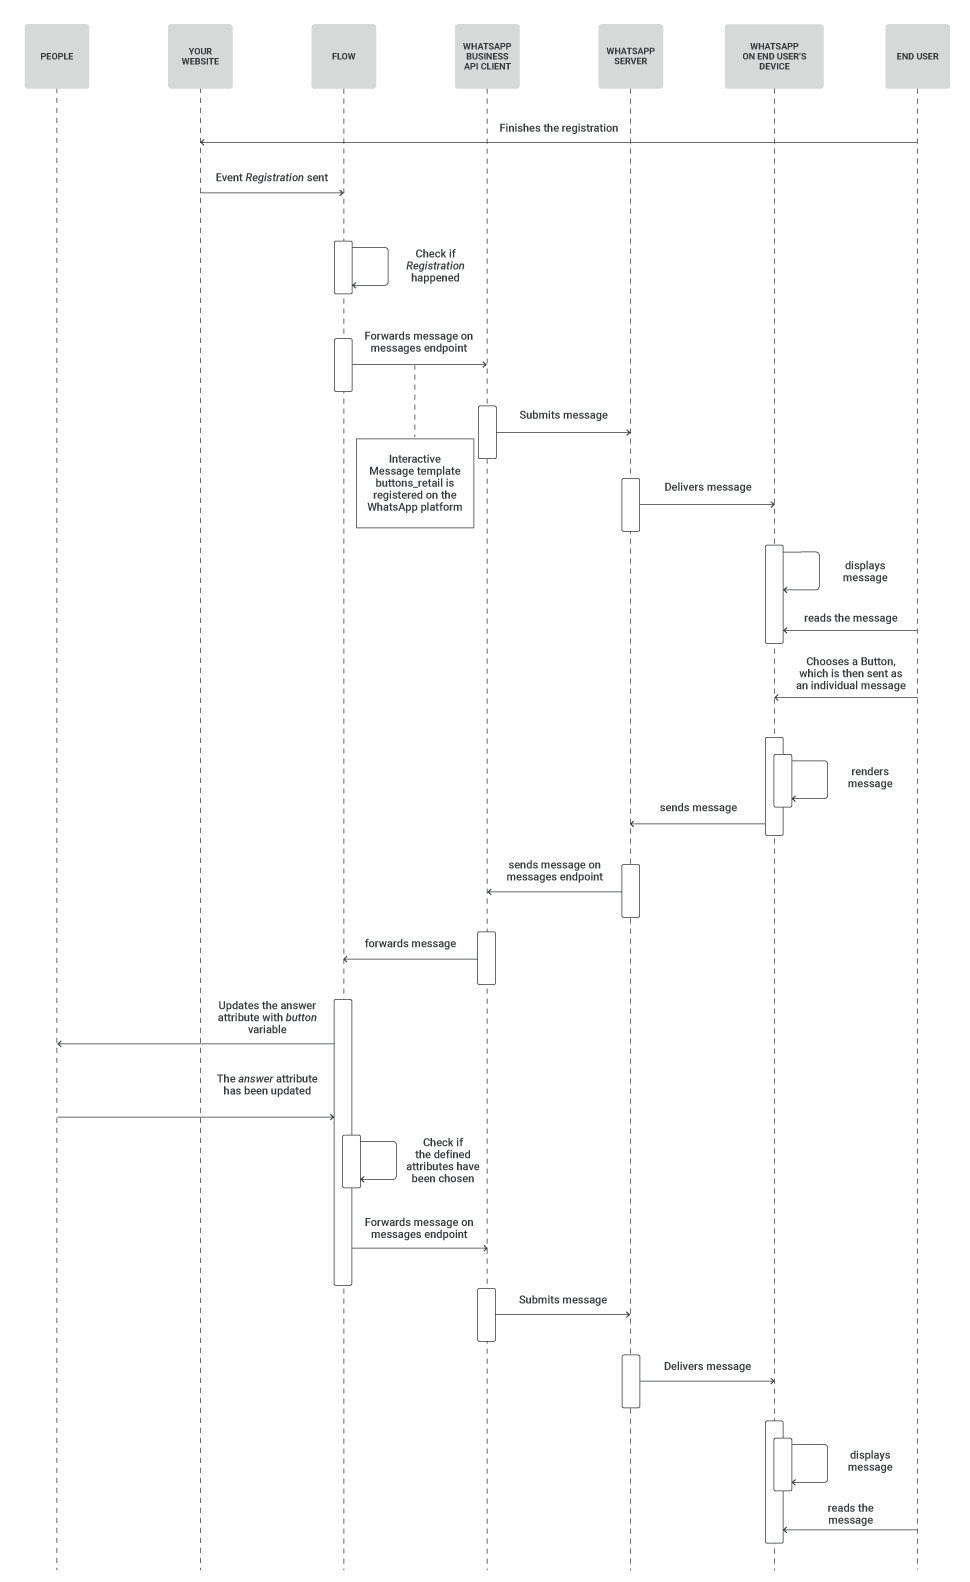 WhatsApp Registration notification use case - process workflow